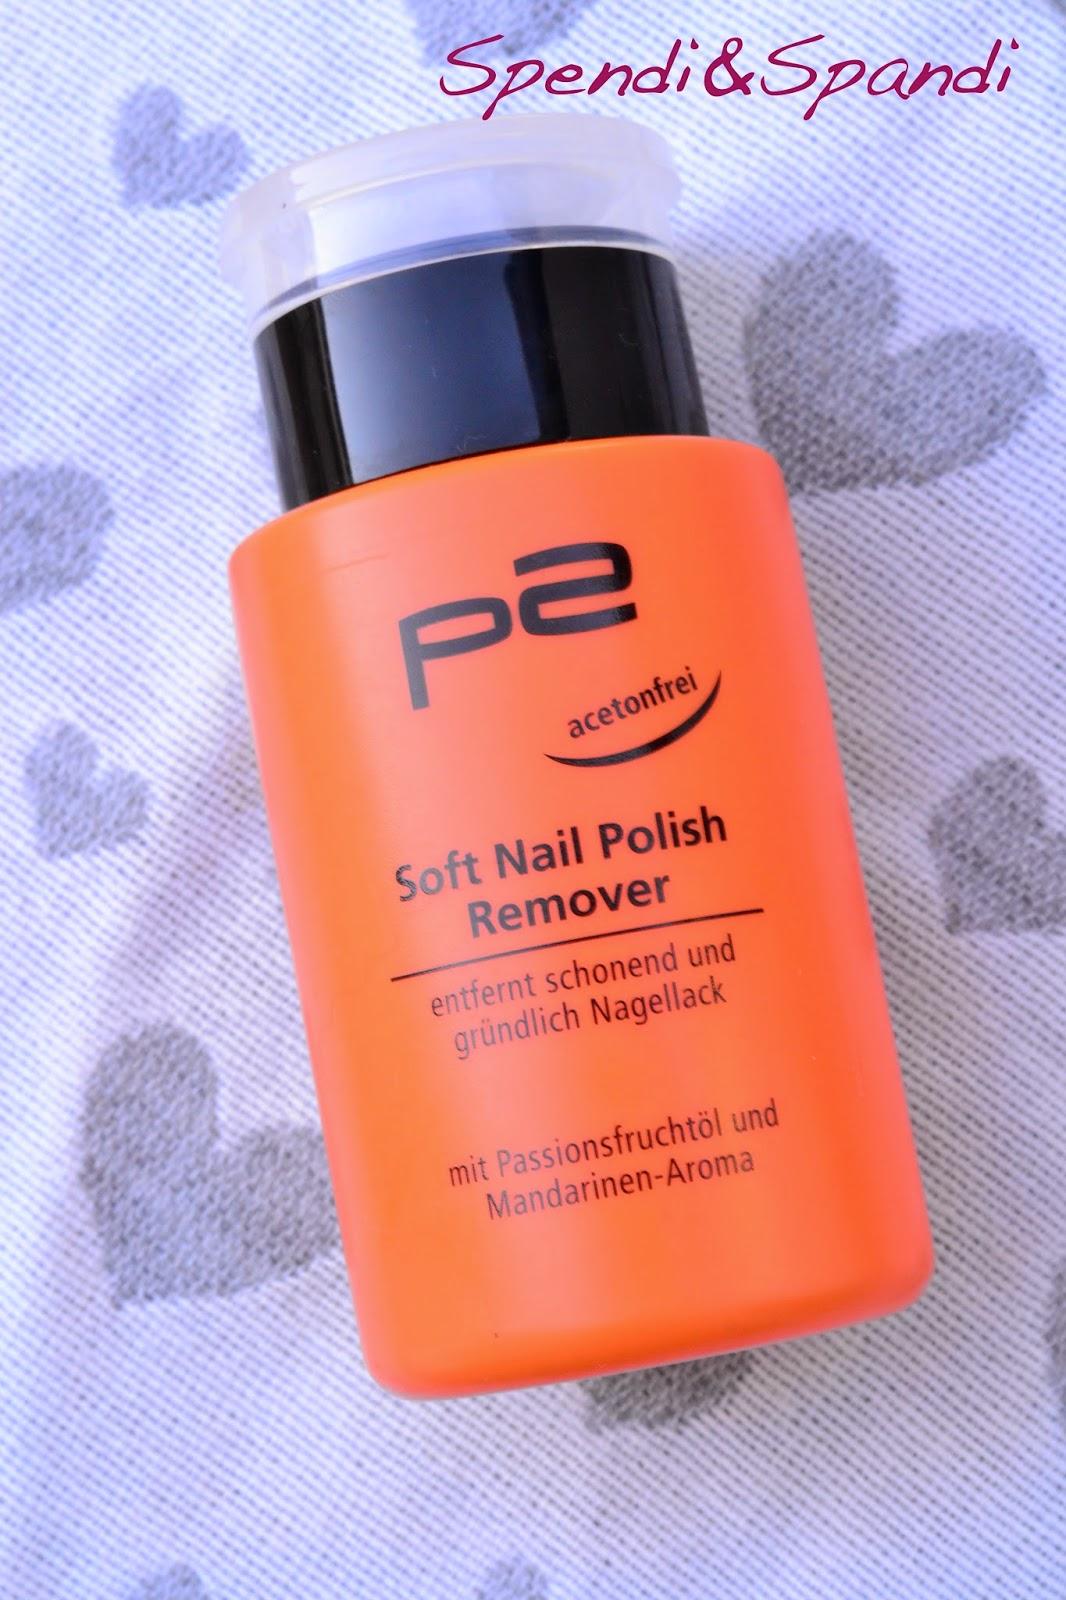 spendi e spandi p2 soft nail polish remover. Black Bedroom Furniture Sets. Home Design Ideas